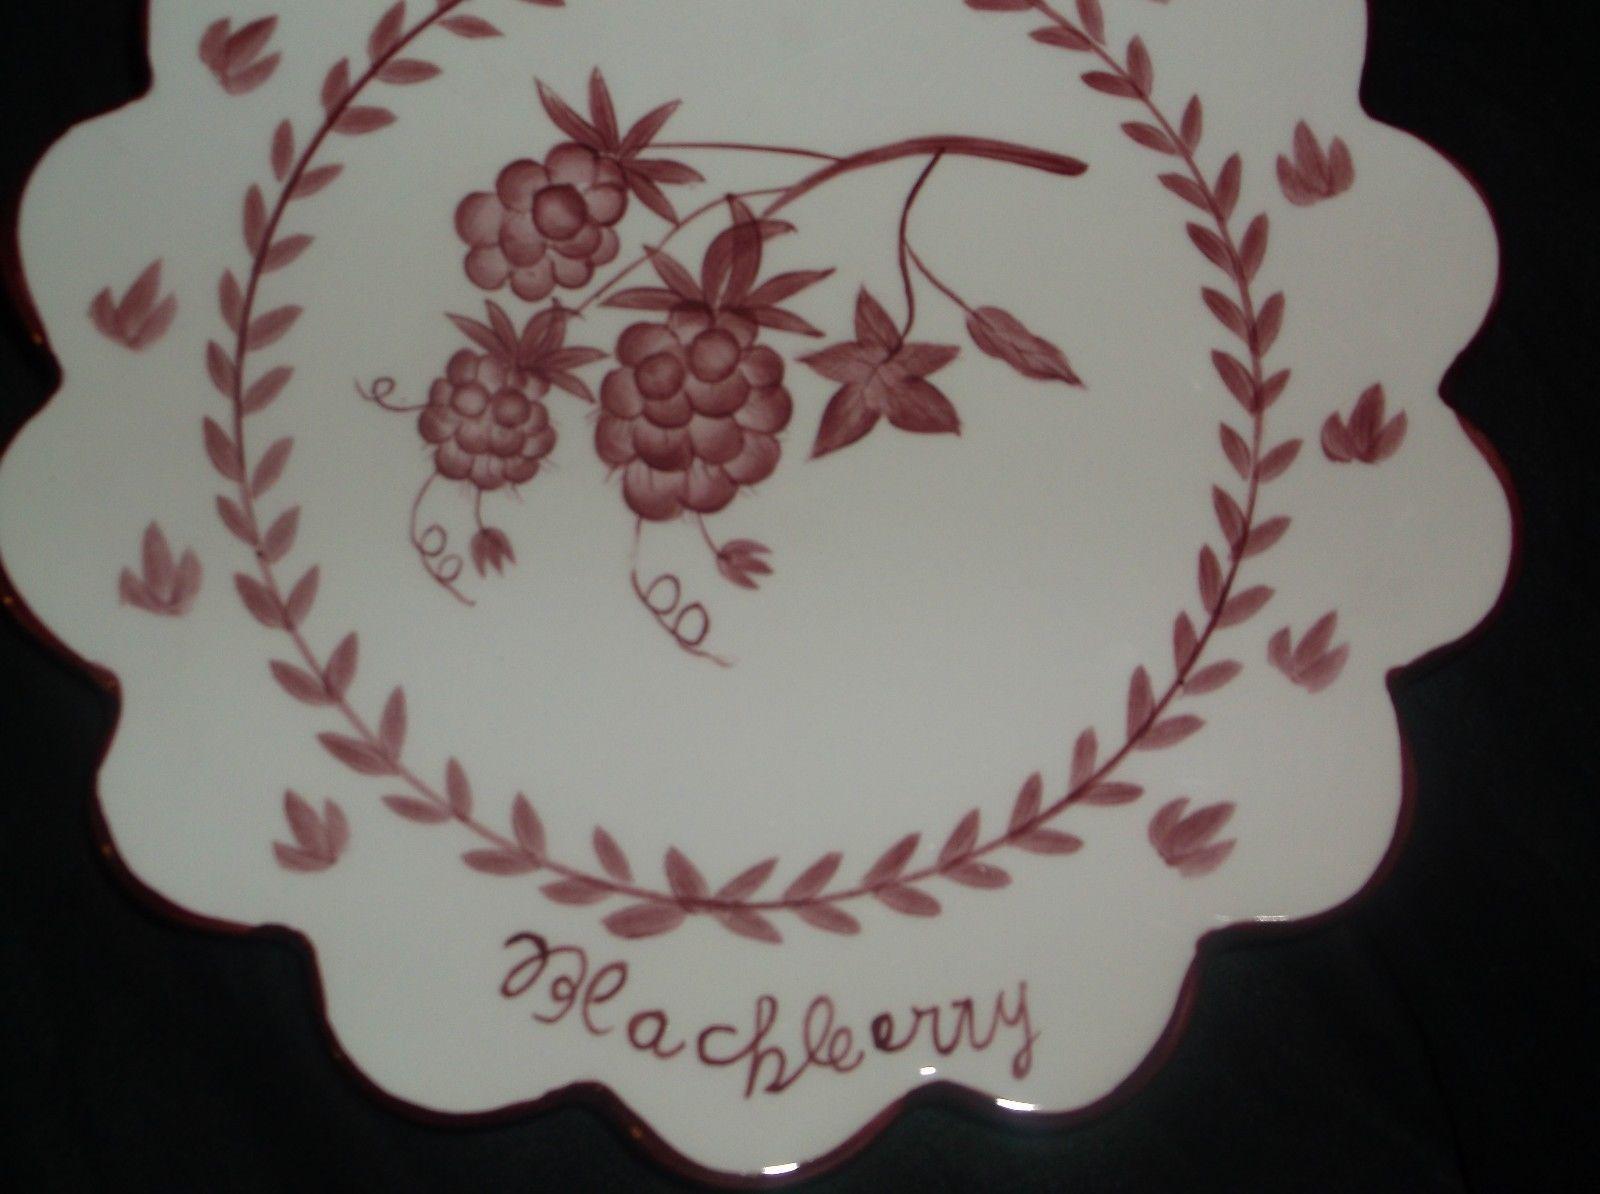 Porcelain wall hanging,Blackberries design/pattern w/ribbon